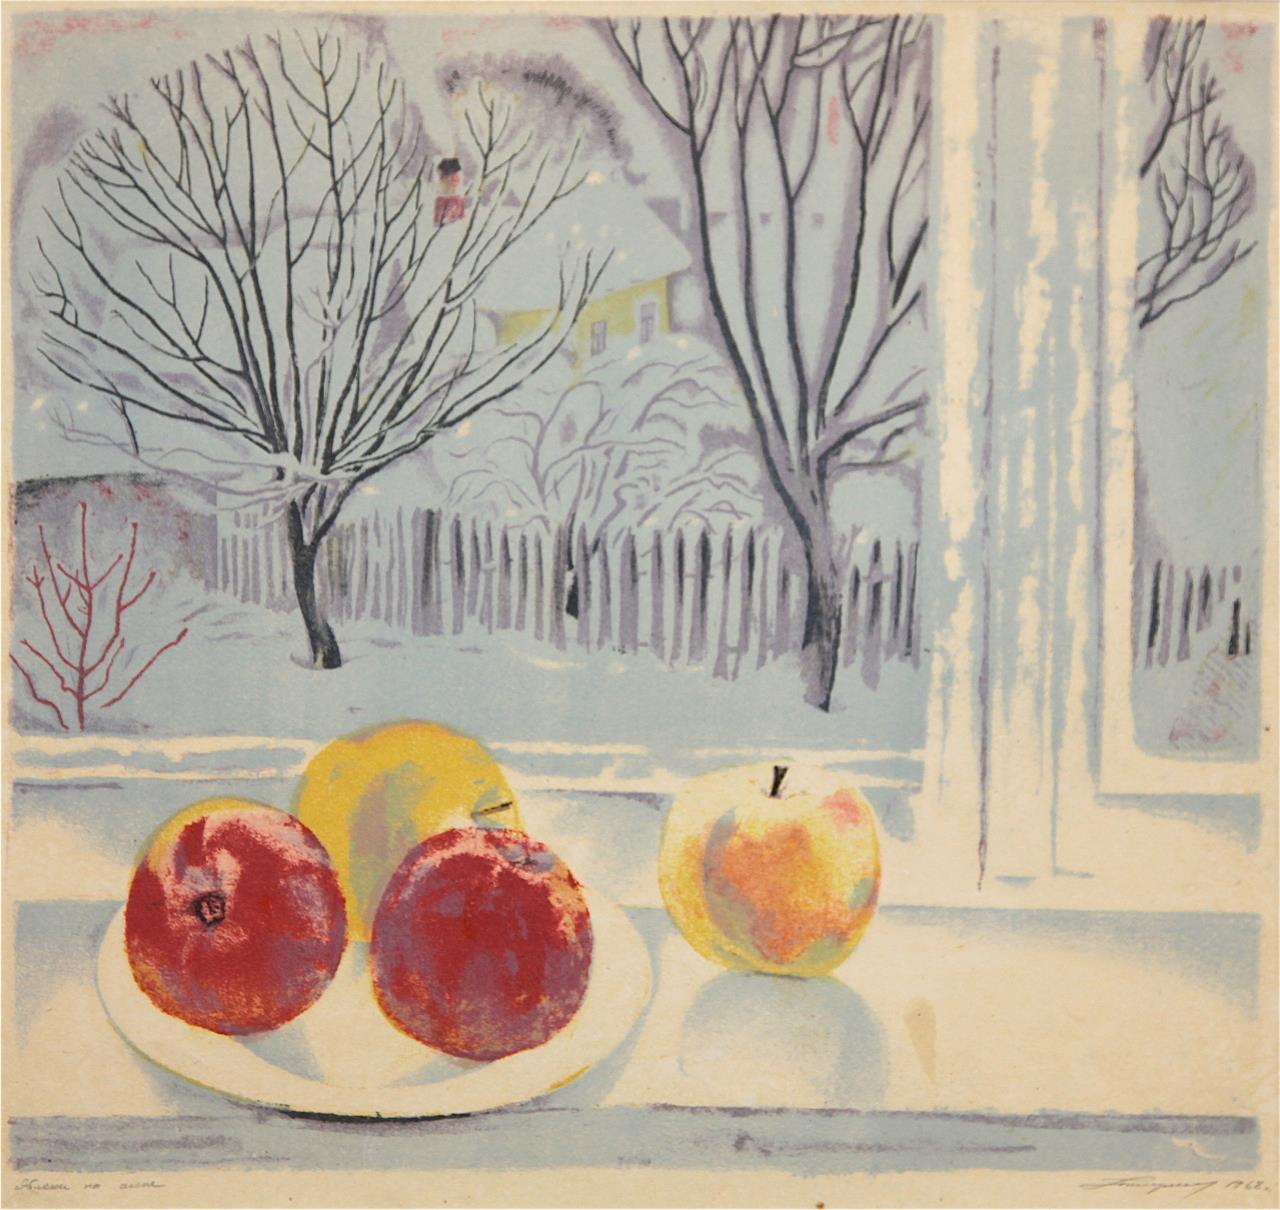 Apples on the Window